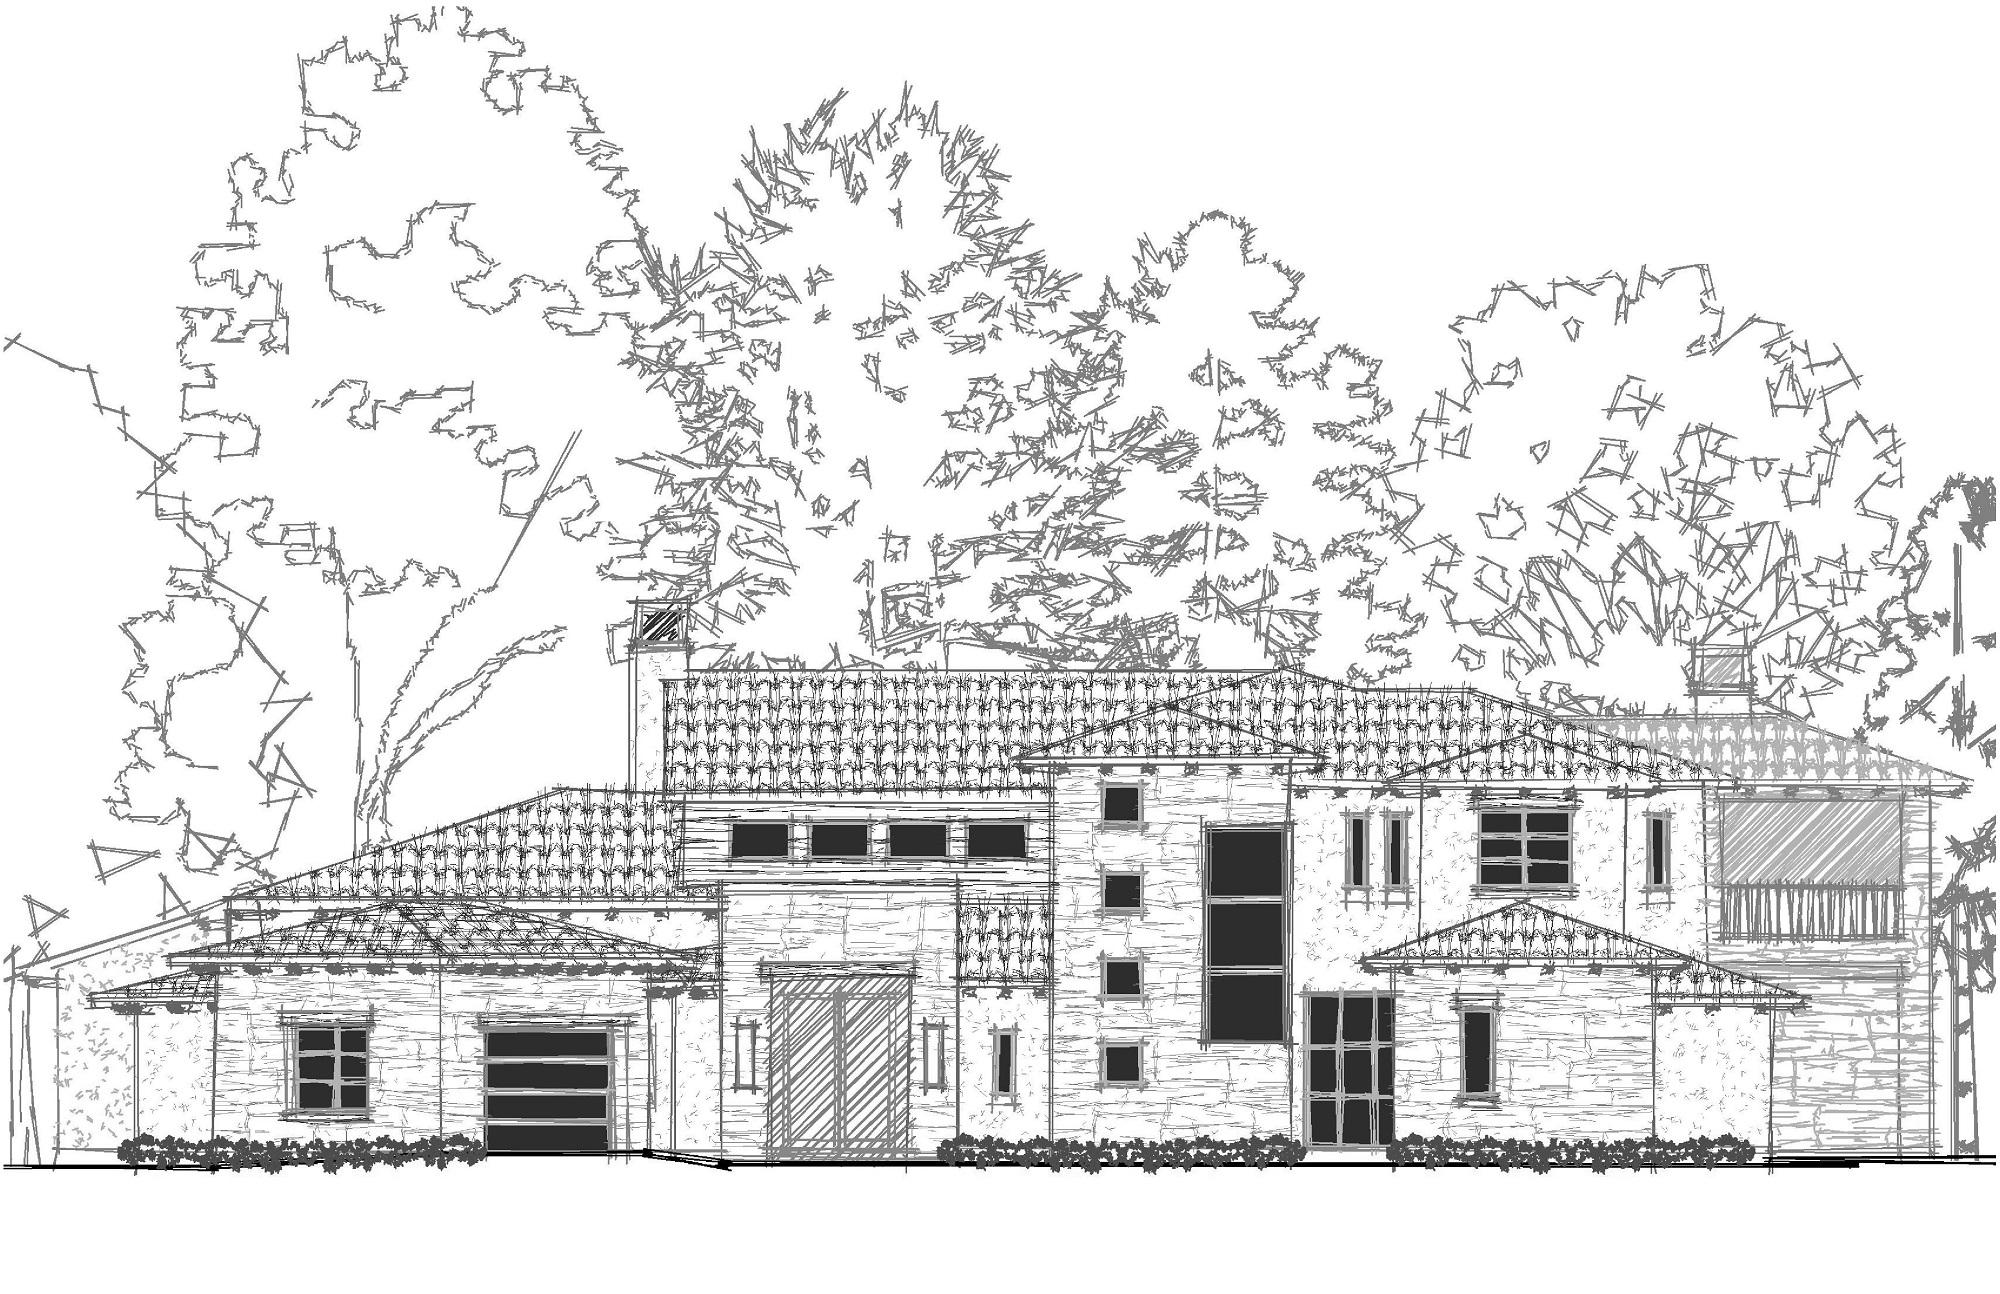 061 Jordan Residence-A0.0 COVER-page-001.jpg